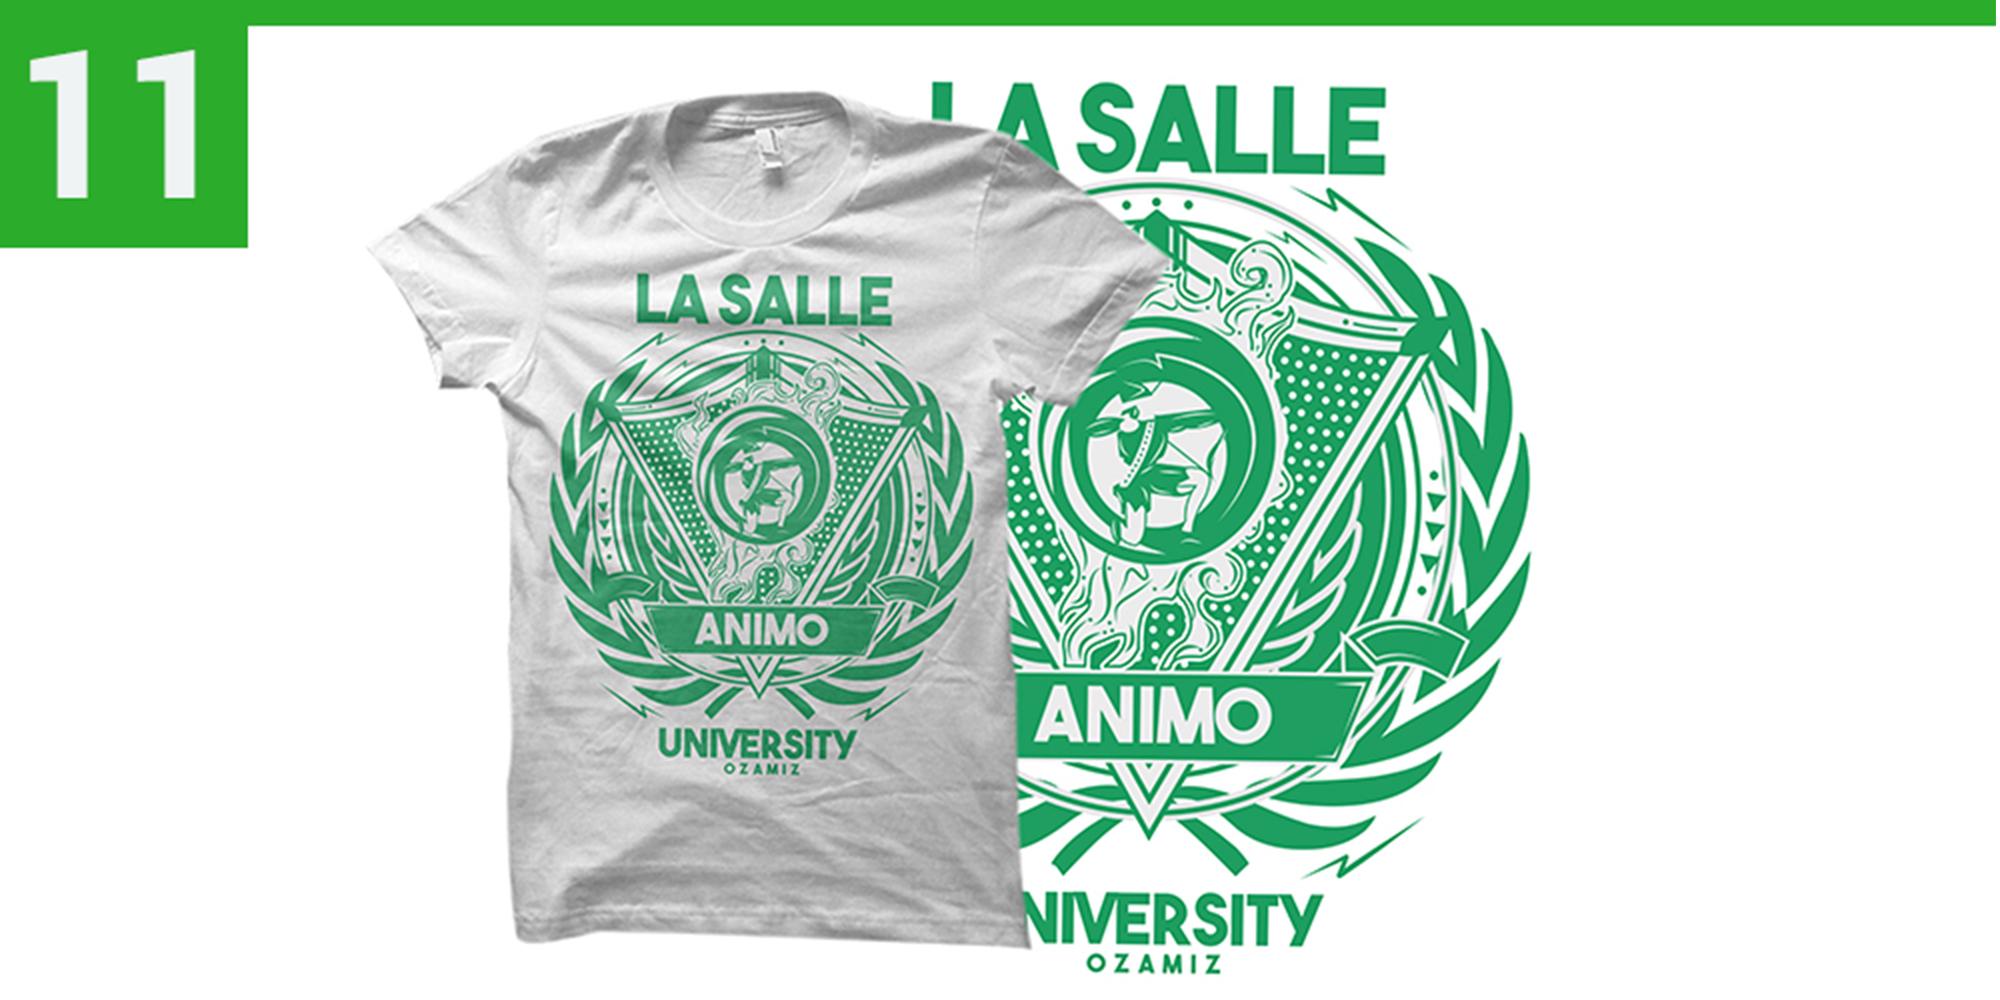 Design t shirt university - Note Deadline For Voting Is On October 16 2016